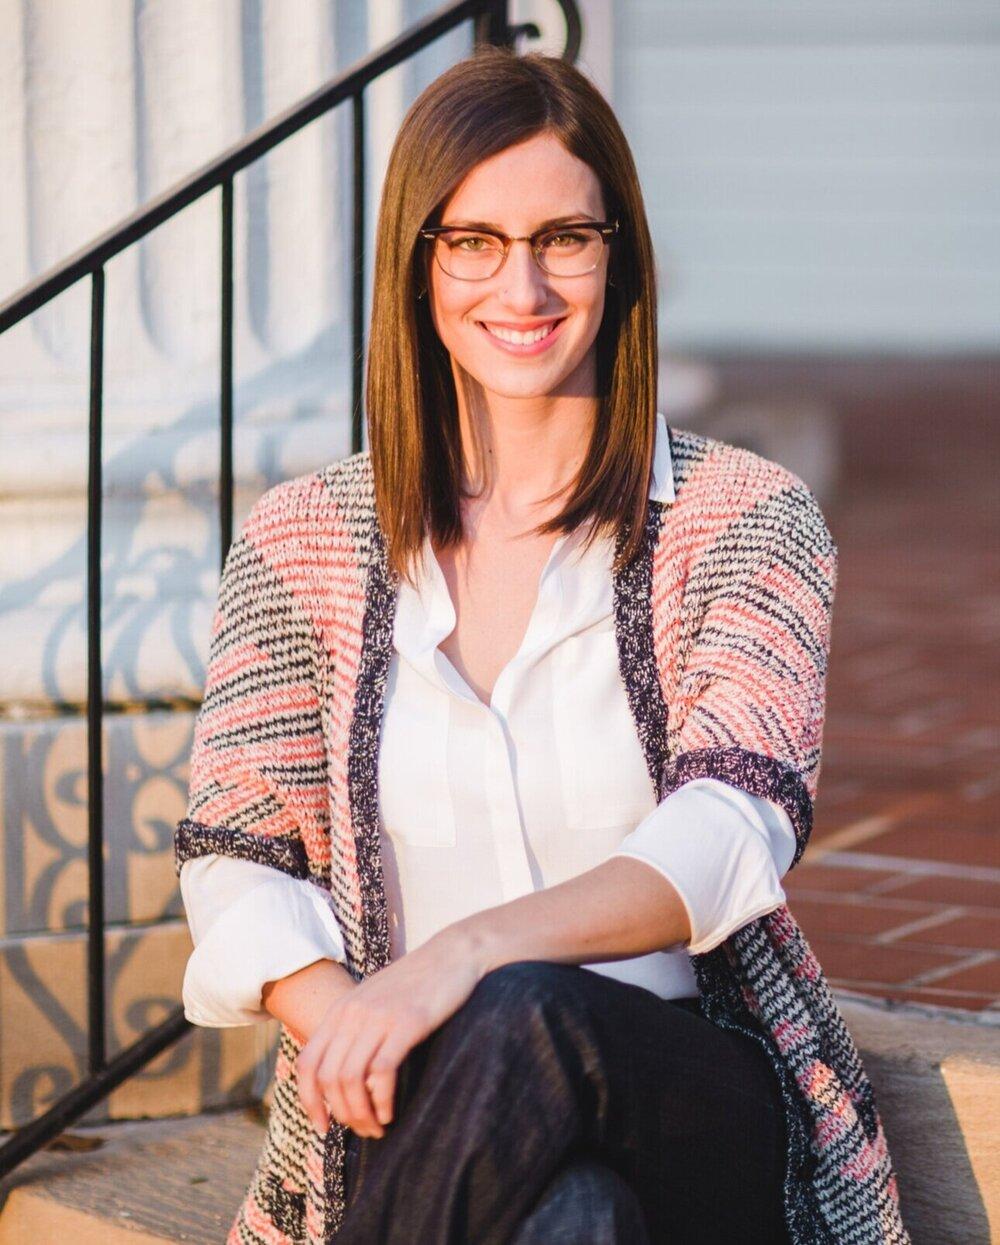 Hannah Standish